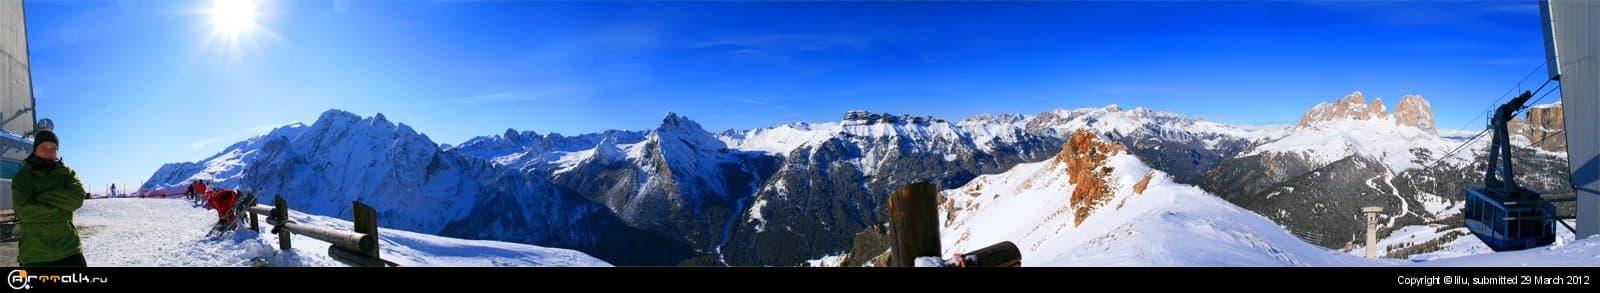 Доломитовы альпы. Панарама